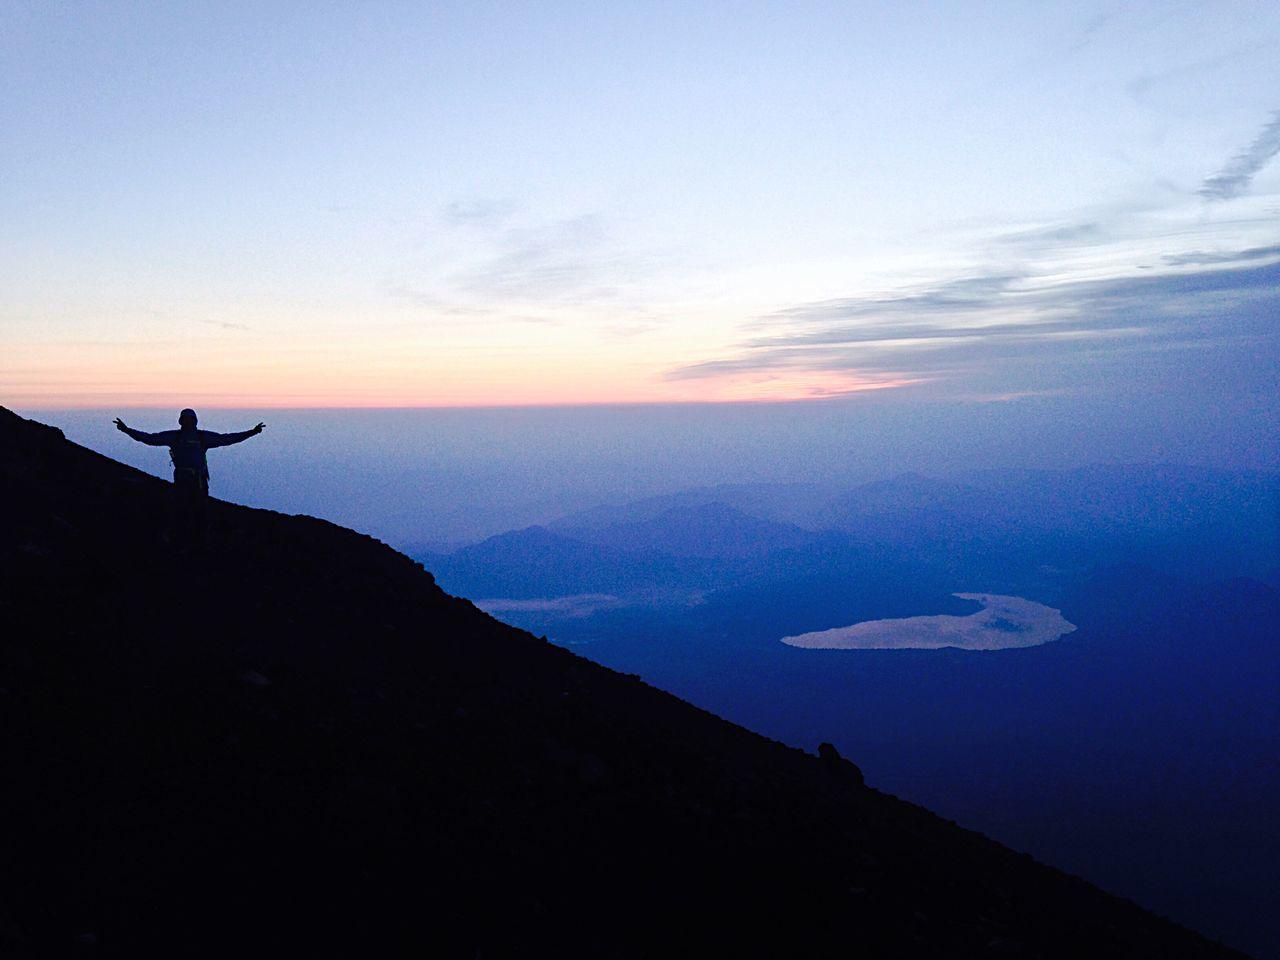 Mount FuJi 富士 山 旭 Mountains Sunrise What A View